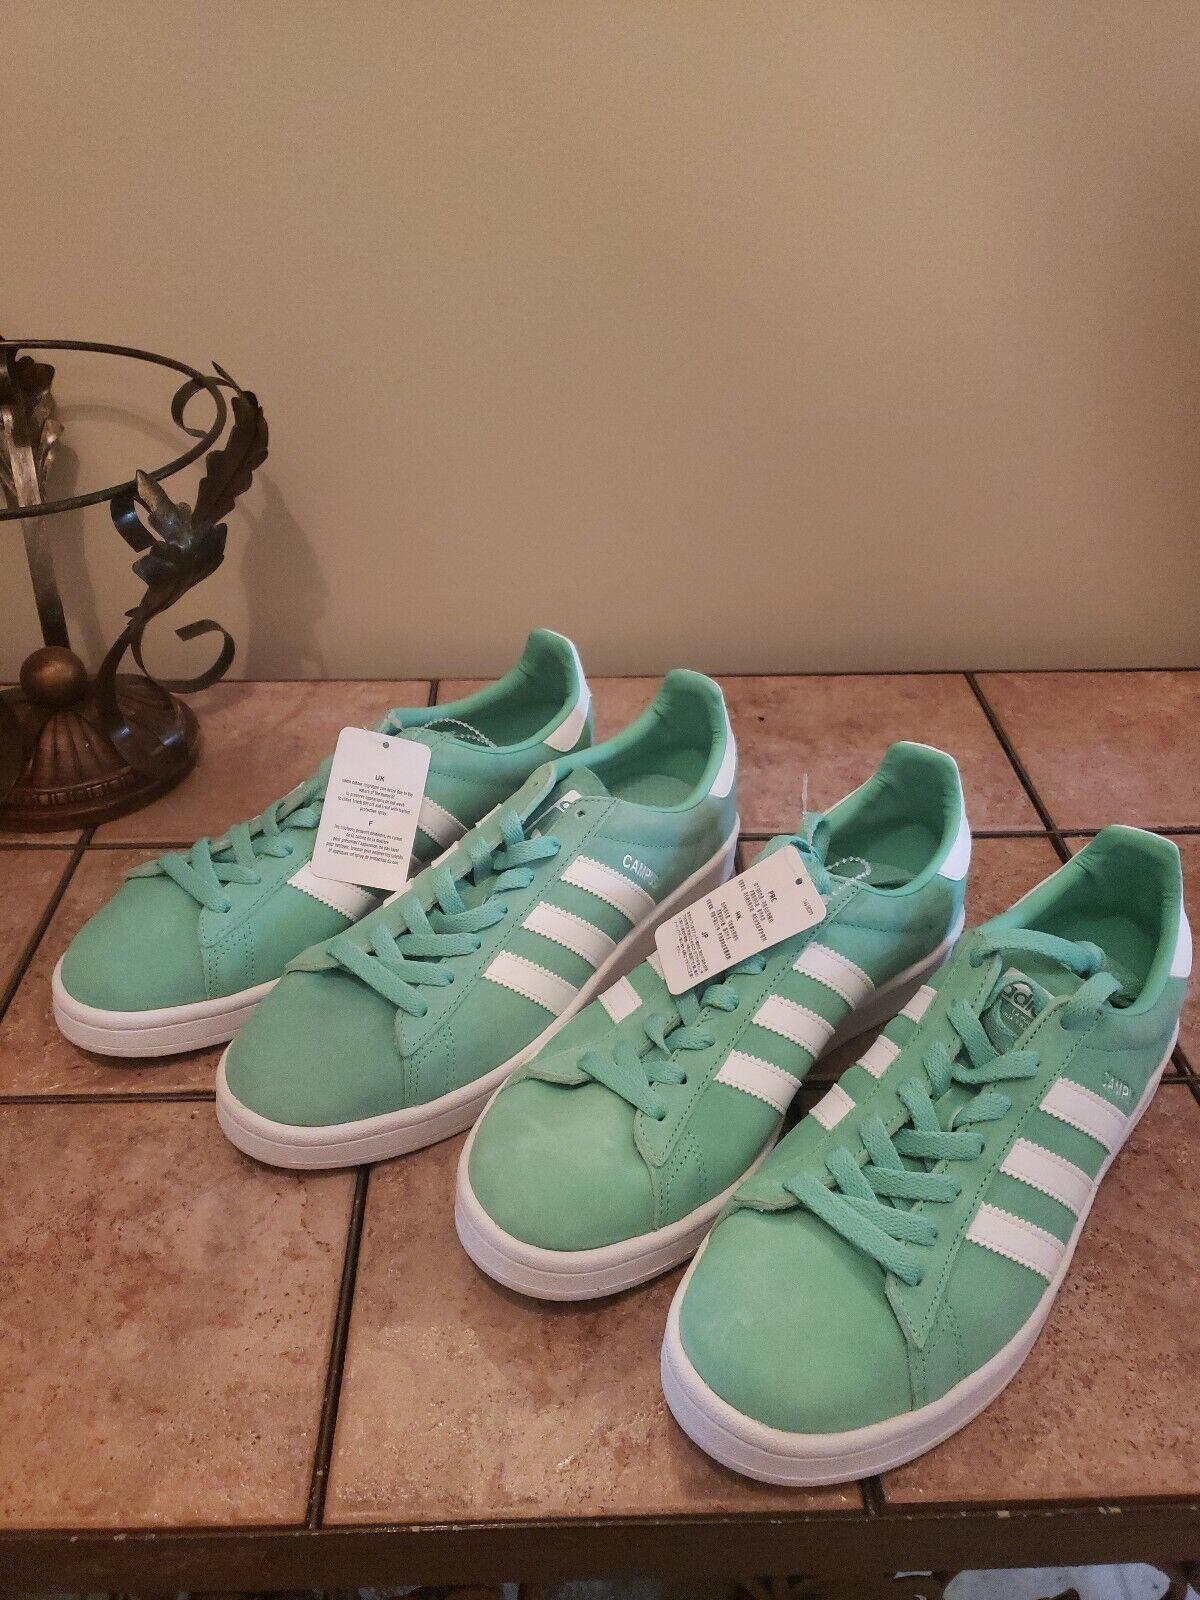 e0b4c2fd897a5 Adidas Mens Originals Campus Sneakers Green Glow White. Size 8.5. BZ0076